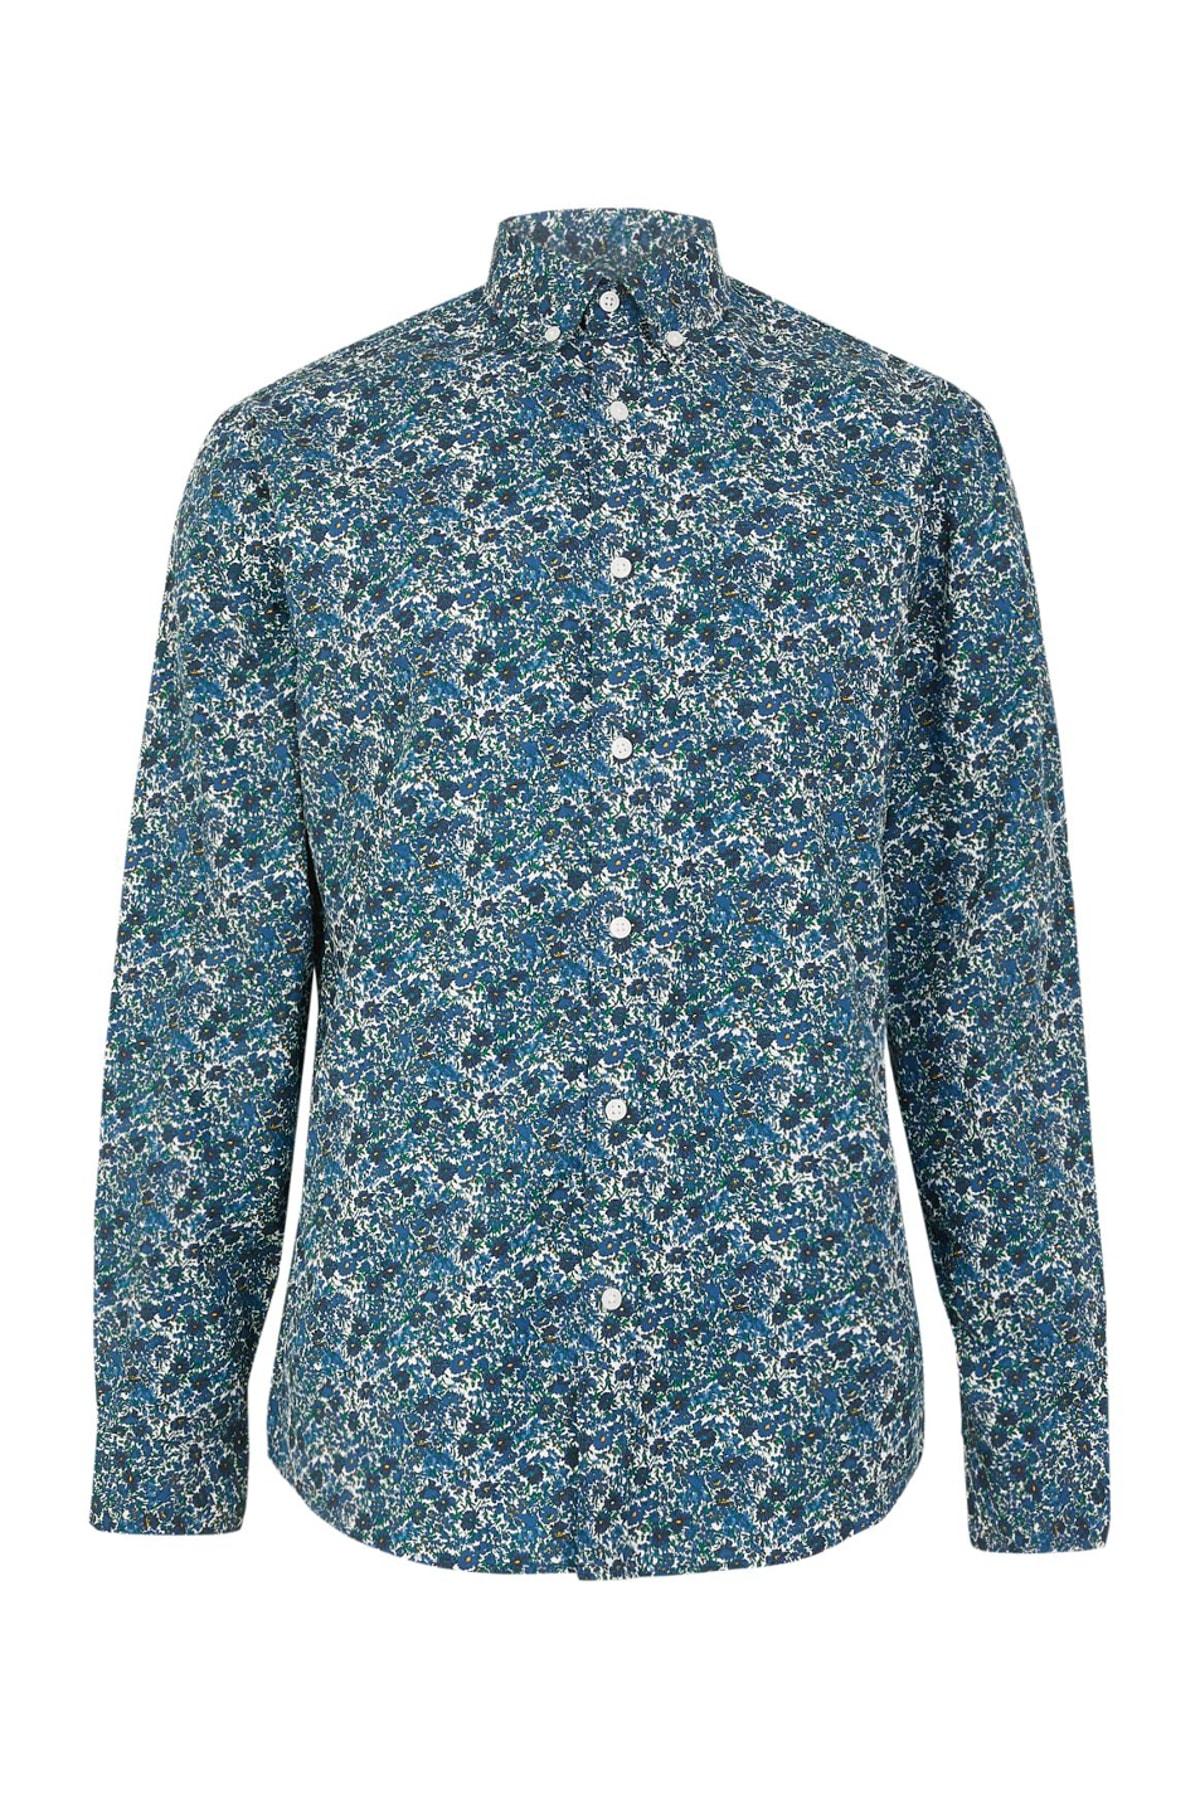 Erkek Blue Mix Pamuklu Çiçek Desenli Relaxed Gömlek T25002882M